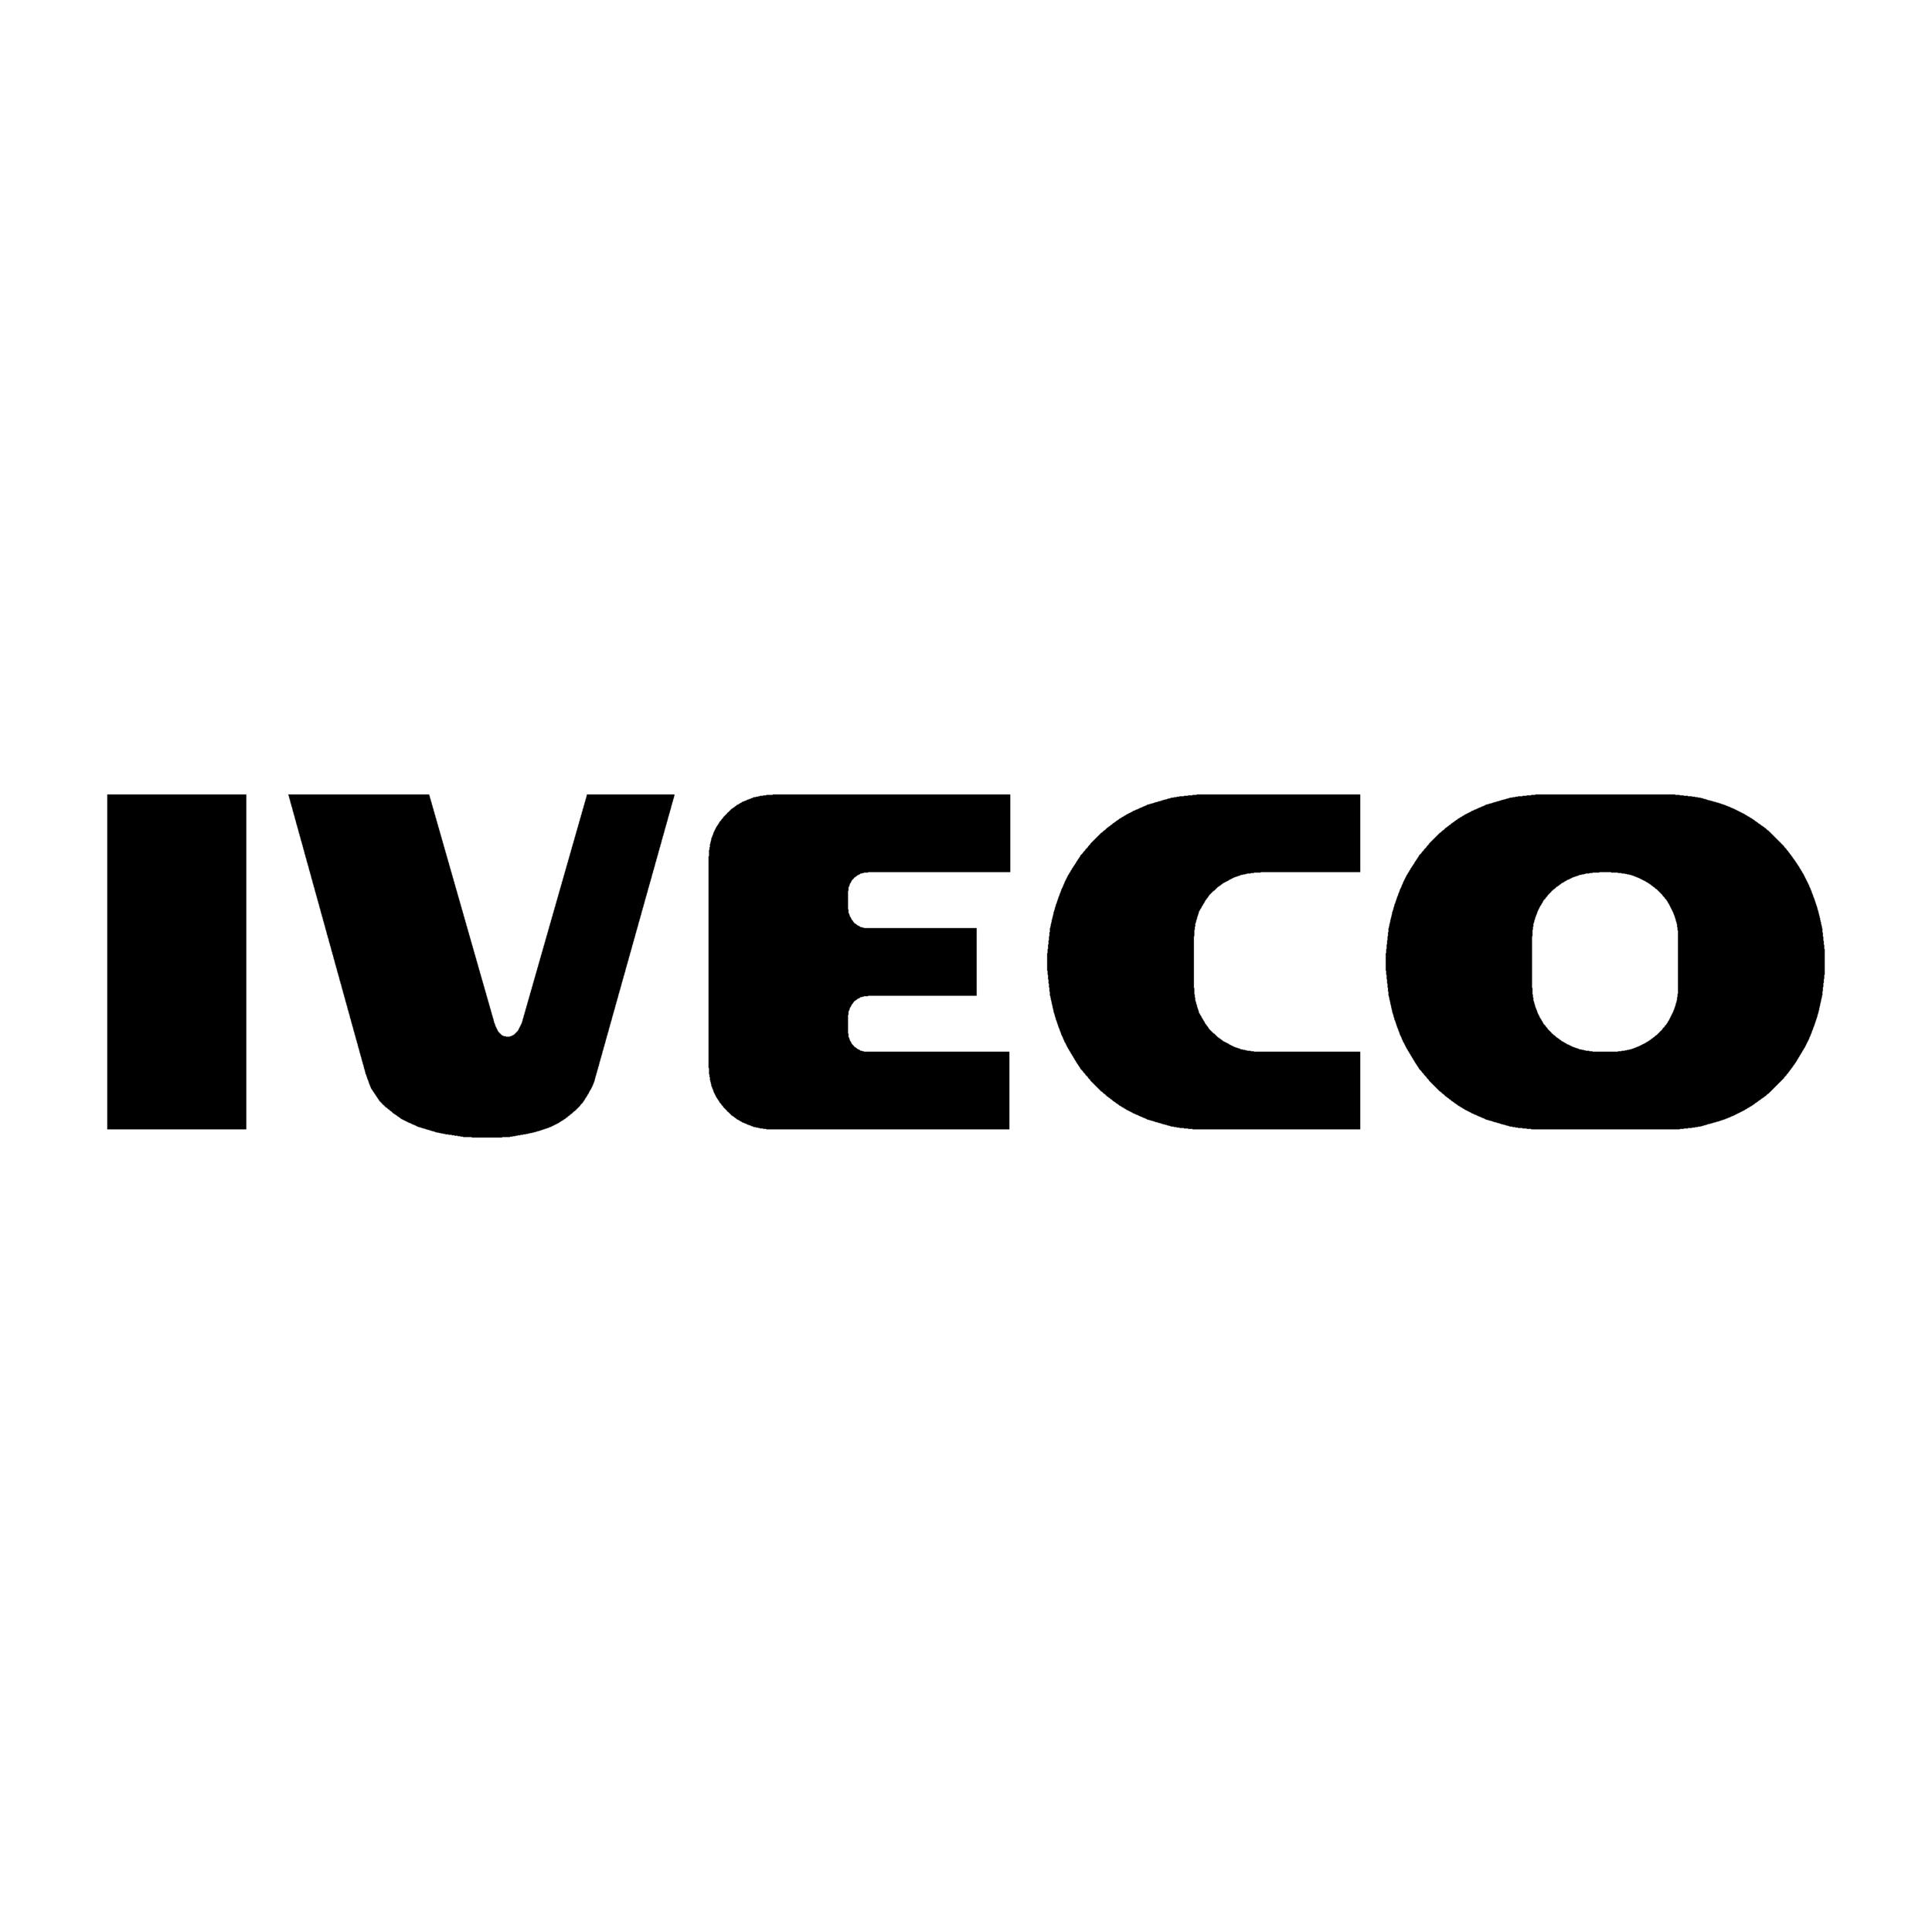 stickers-iveco-ref-1-auto-tuning-amortisseur-4x4-tout-terrain-auto-camion-competition-rallye-autocollant-min